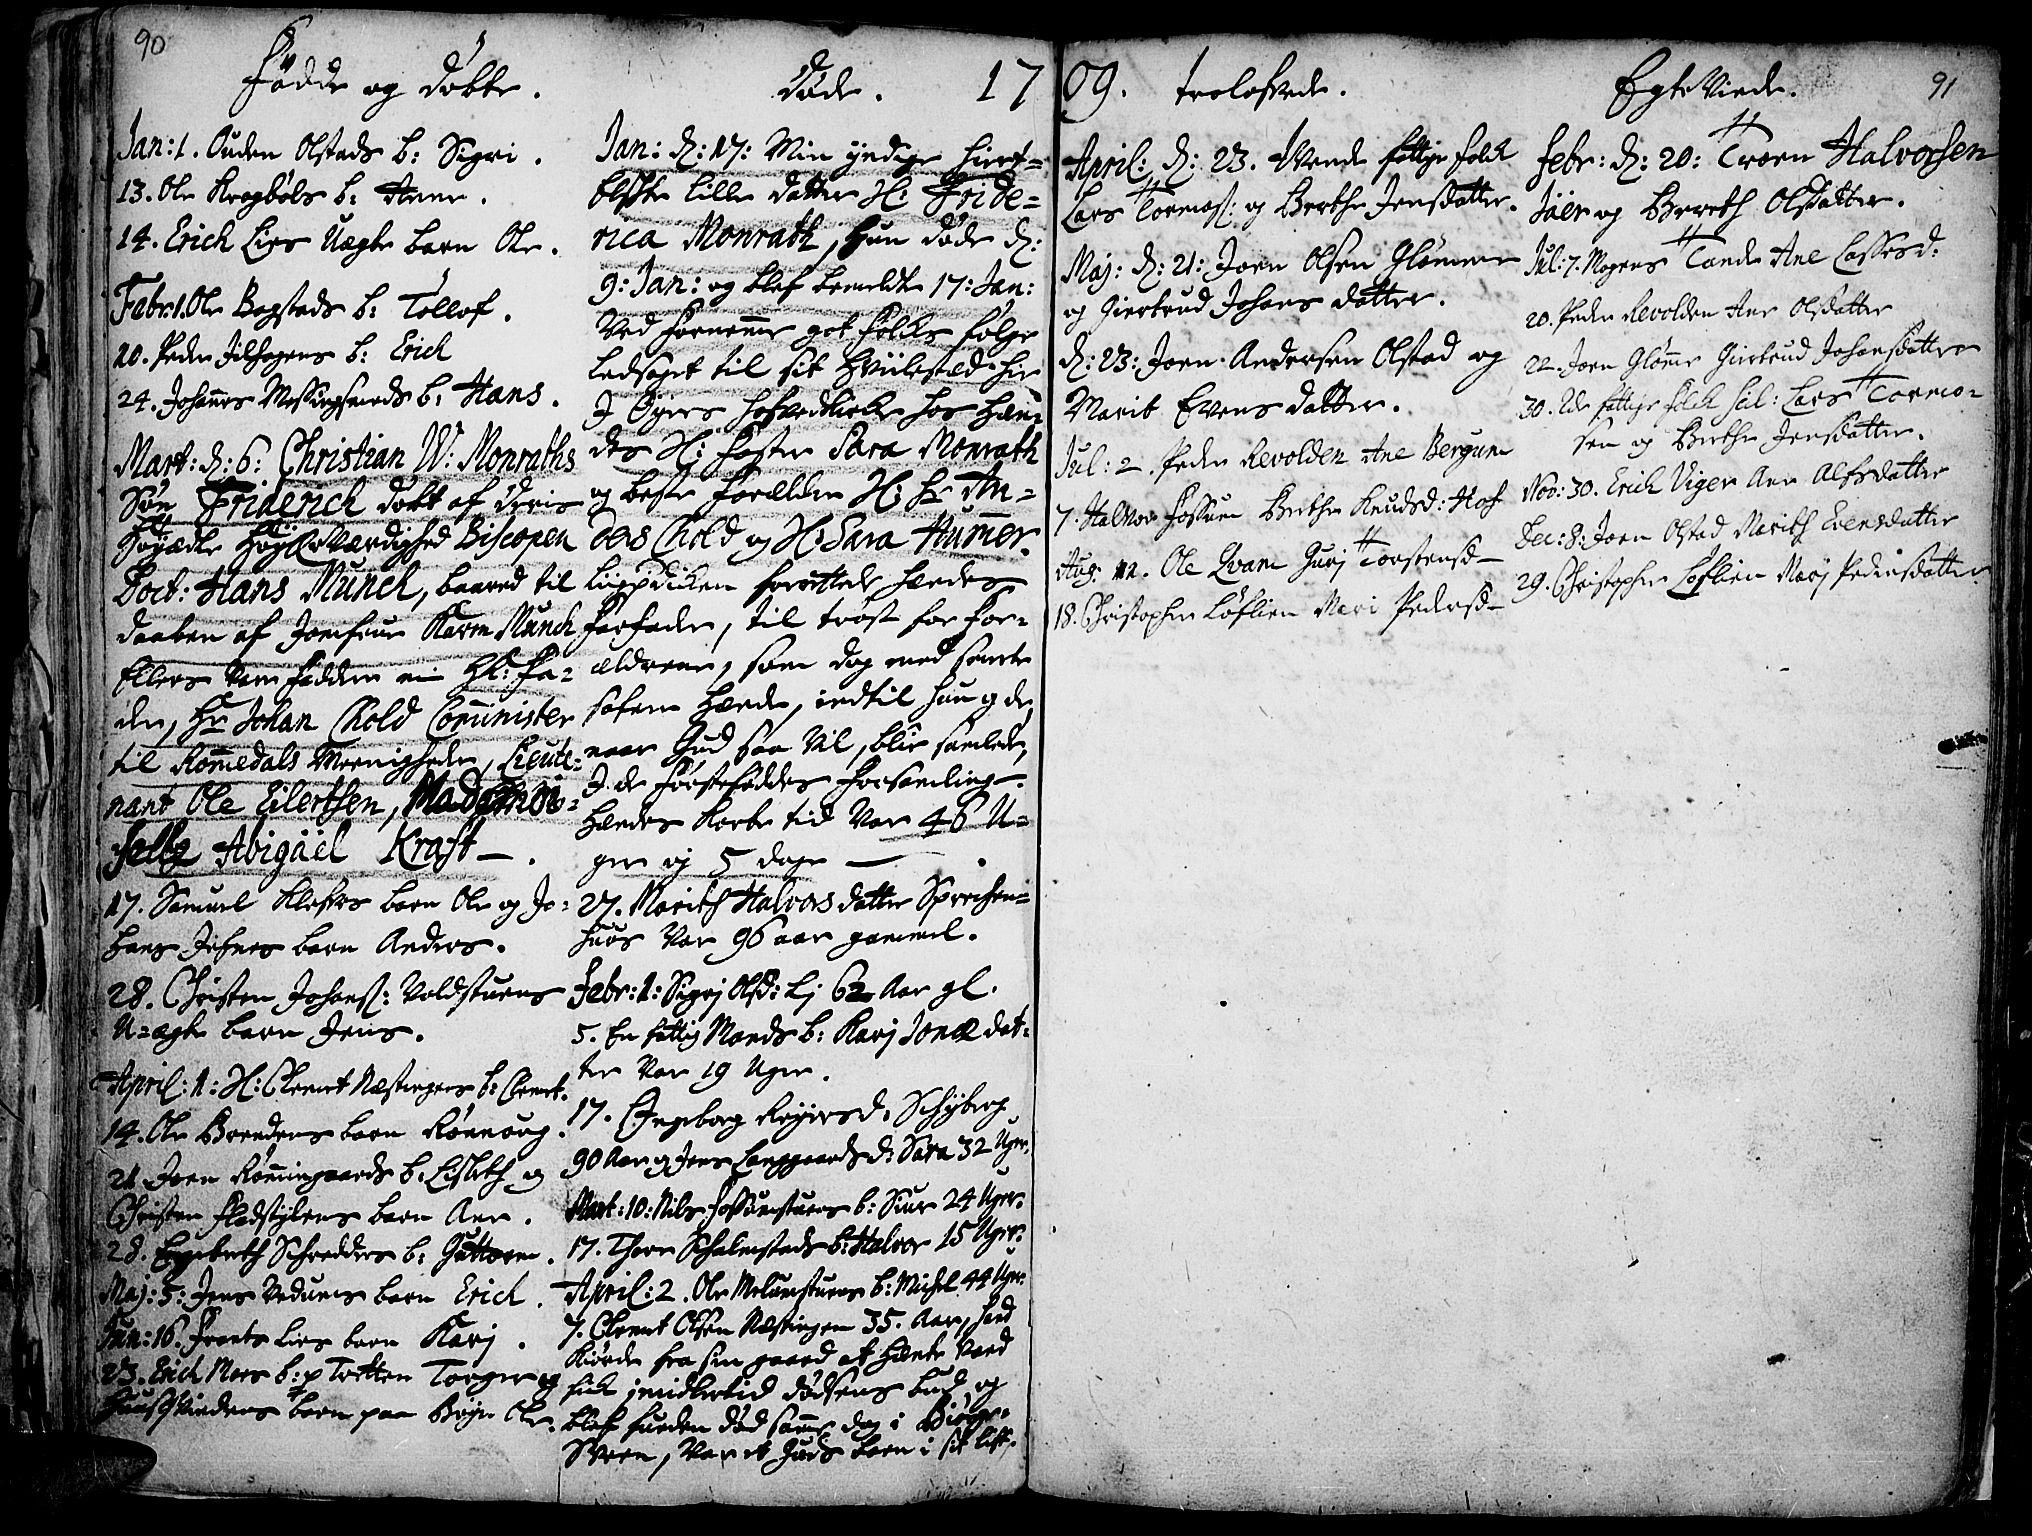 SAH, Øyer prestekontor, Ministerialbok nr. 1, 1671-1727, s. 90-91